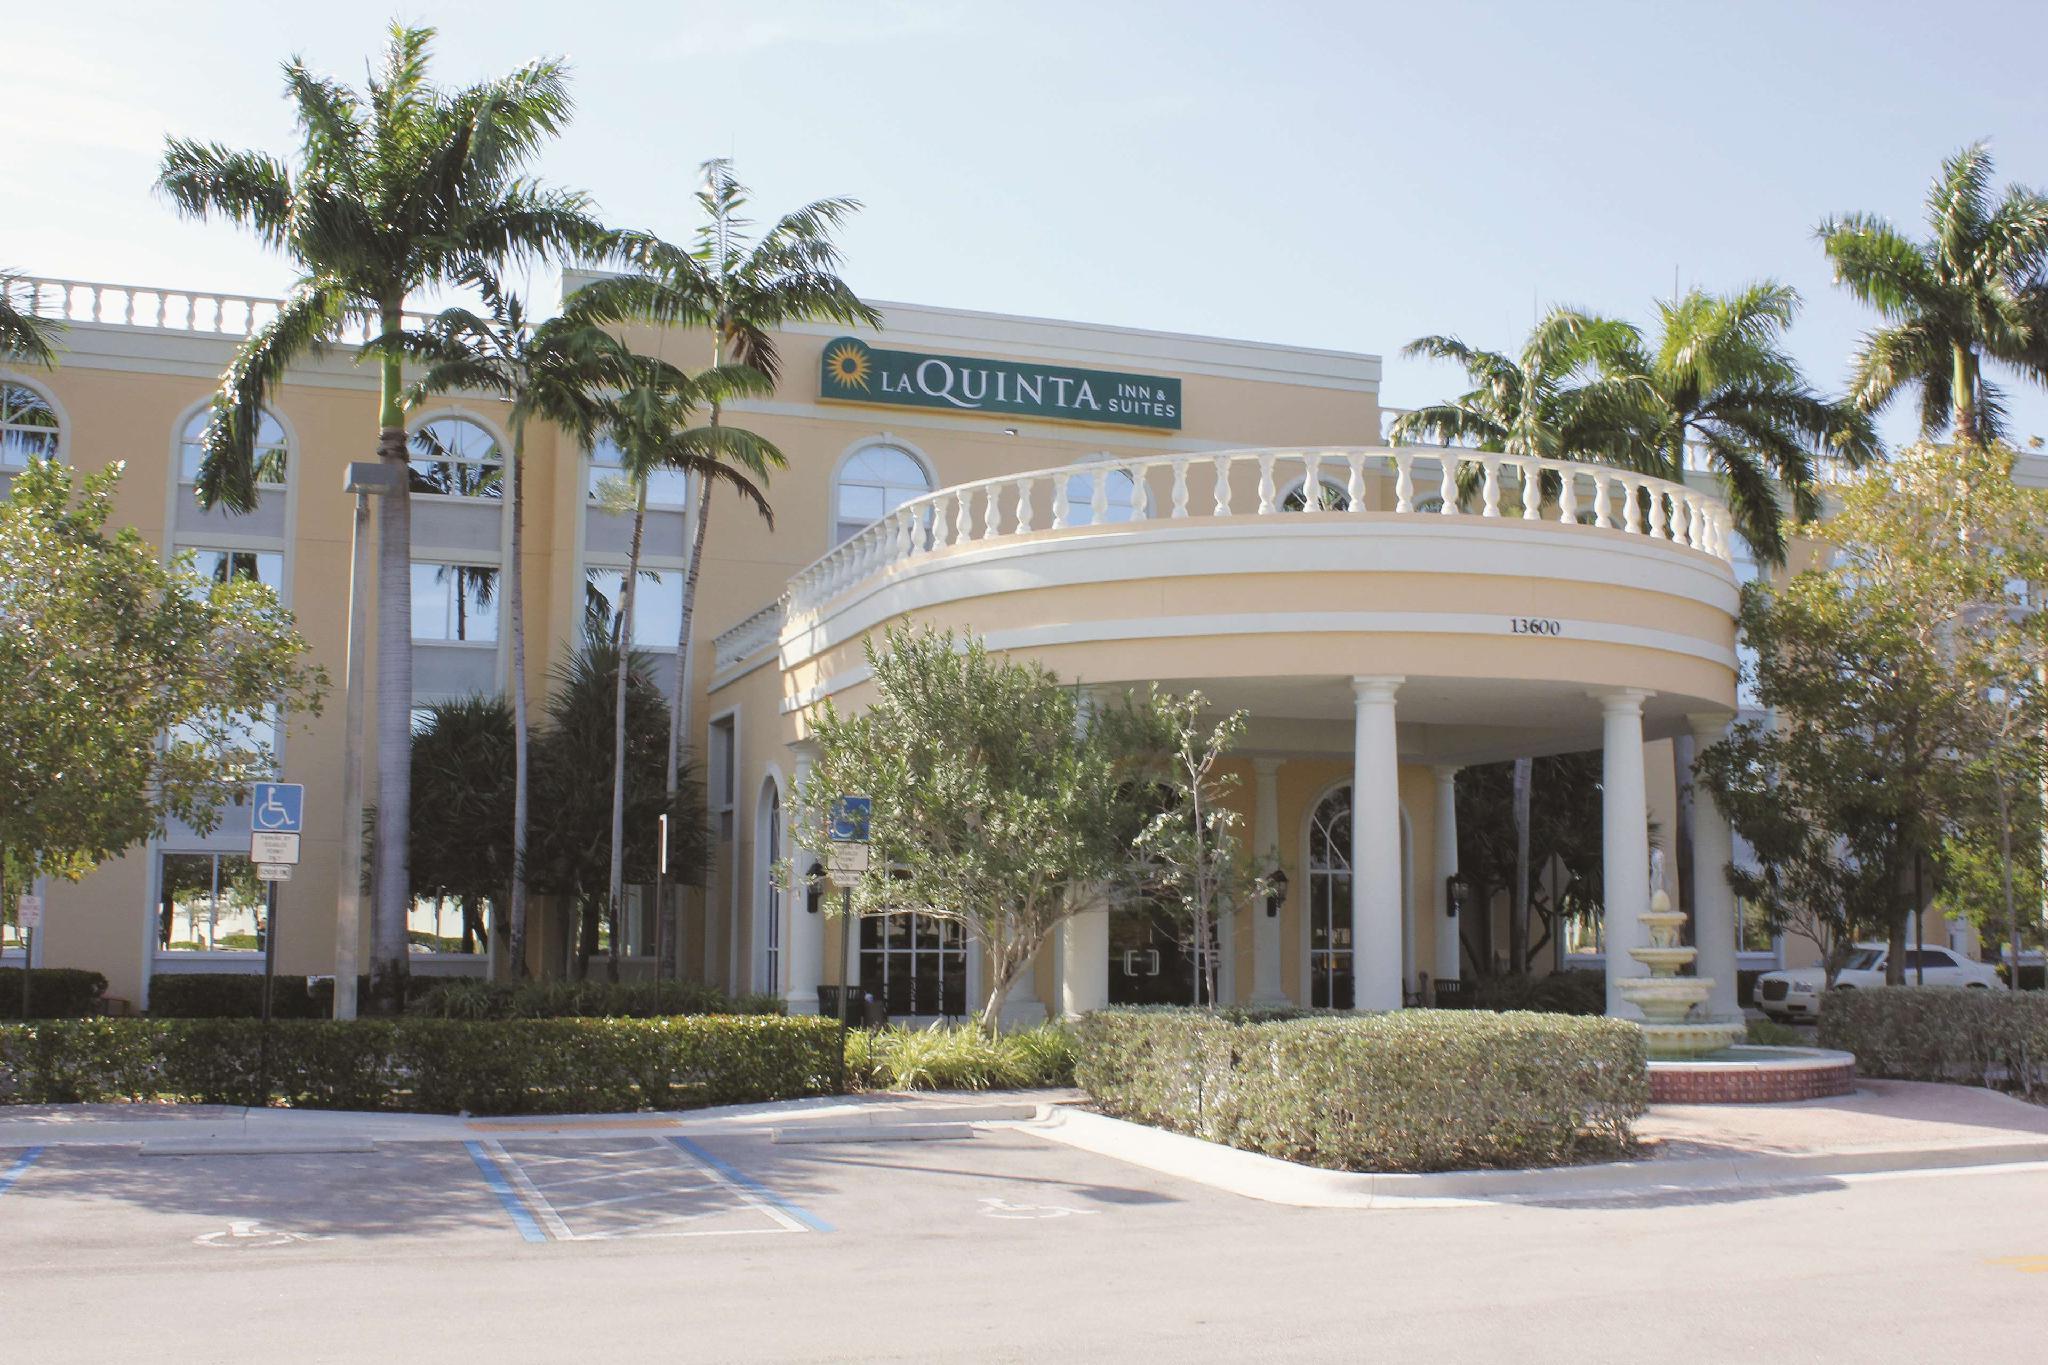 La Quinta Inn And Suites By Wyndham Sunrise